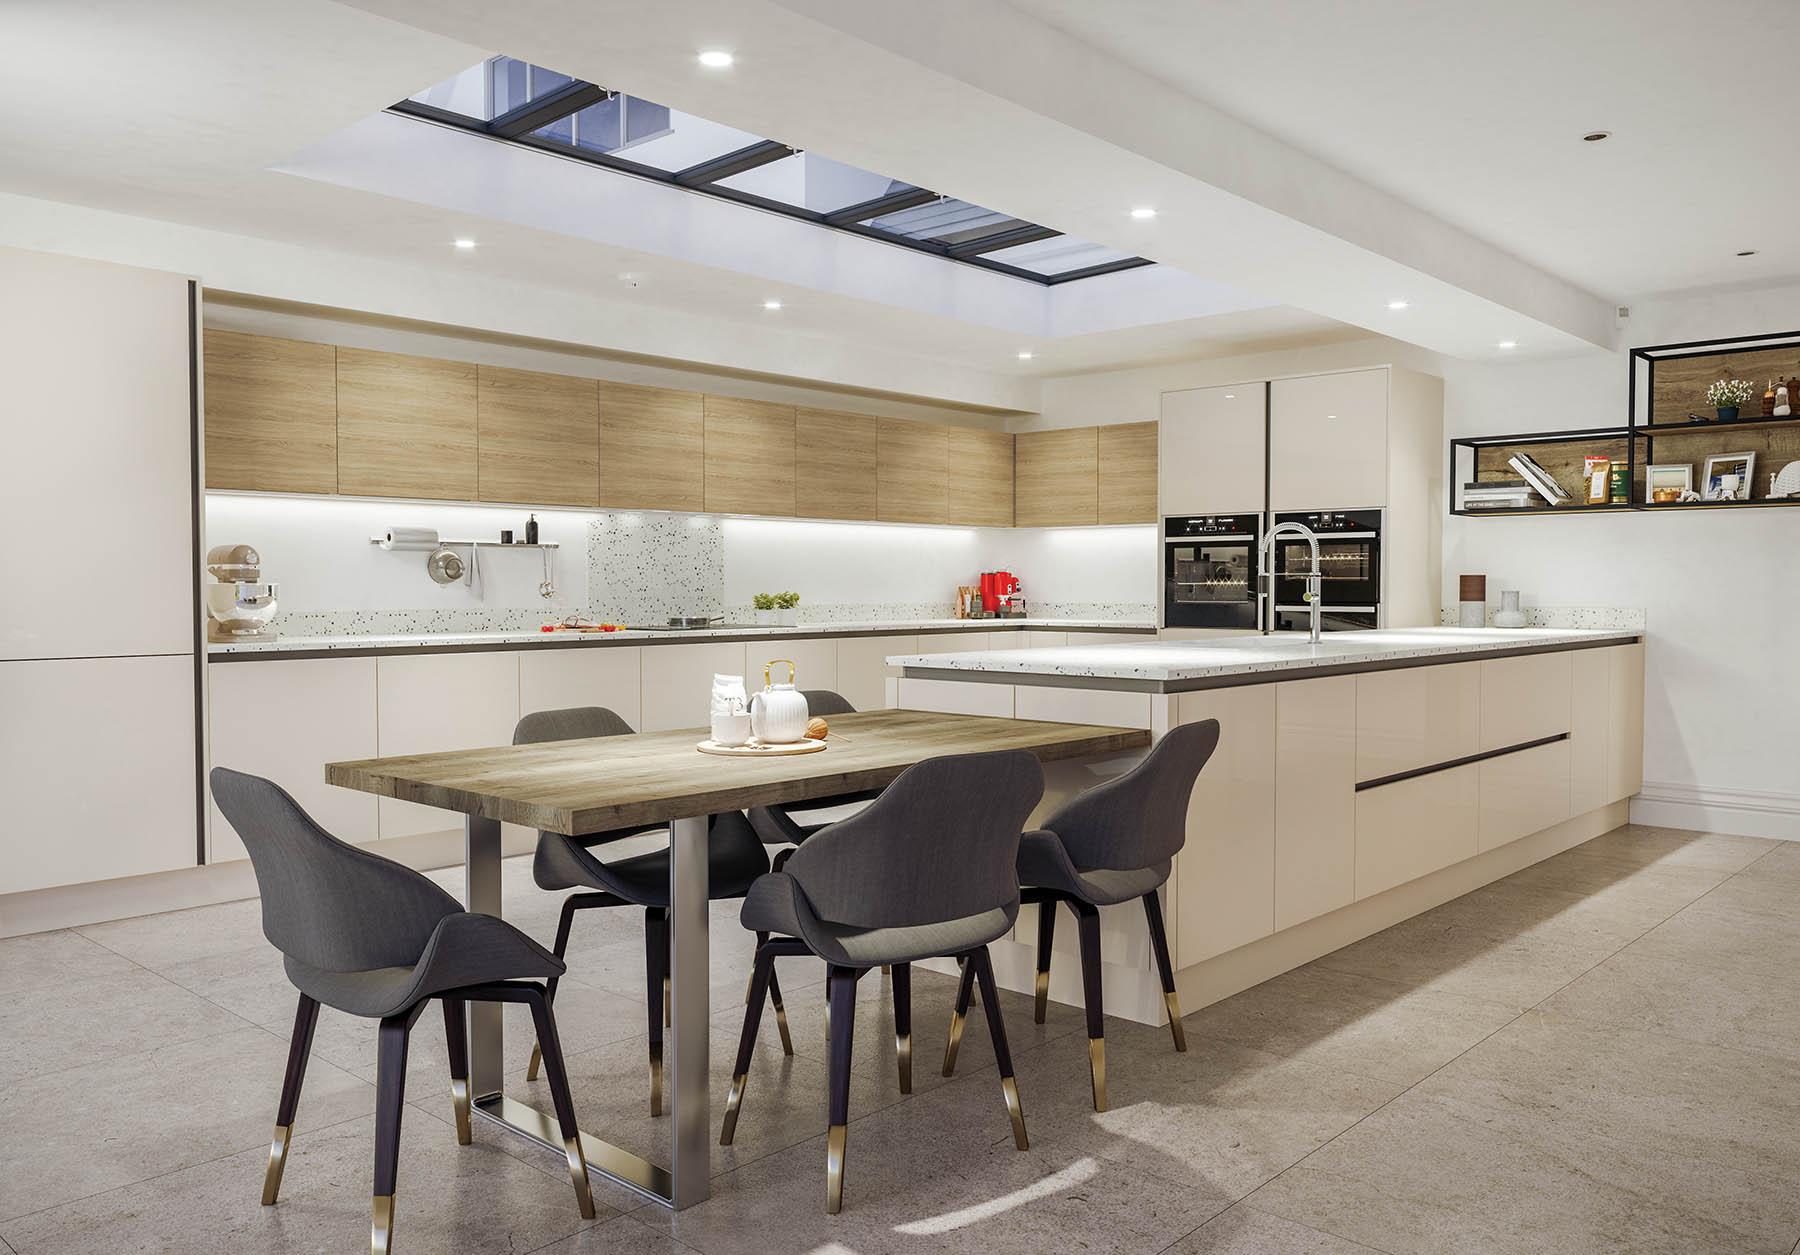 mala collection - cloud 9 installs | modern kitchen design